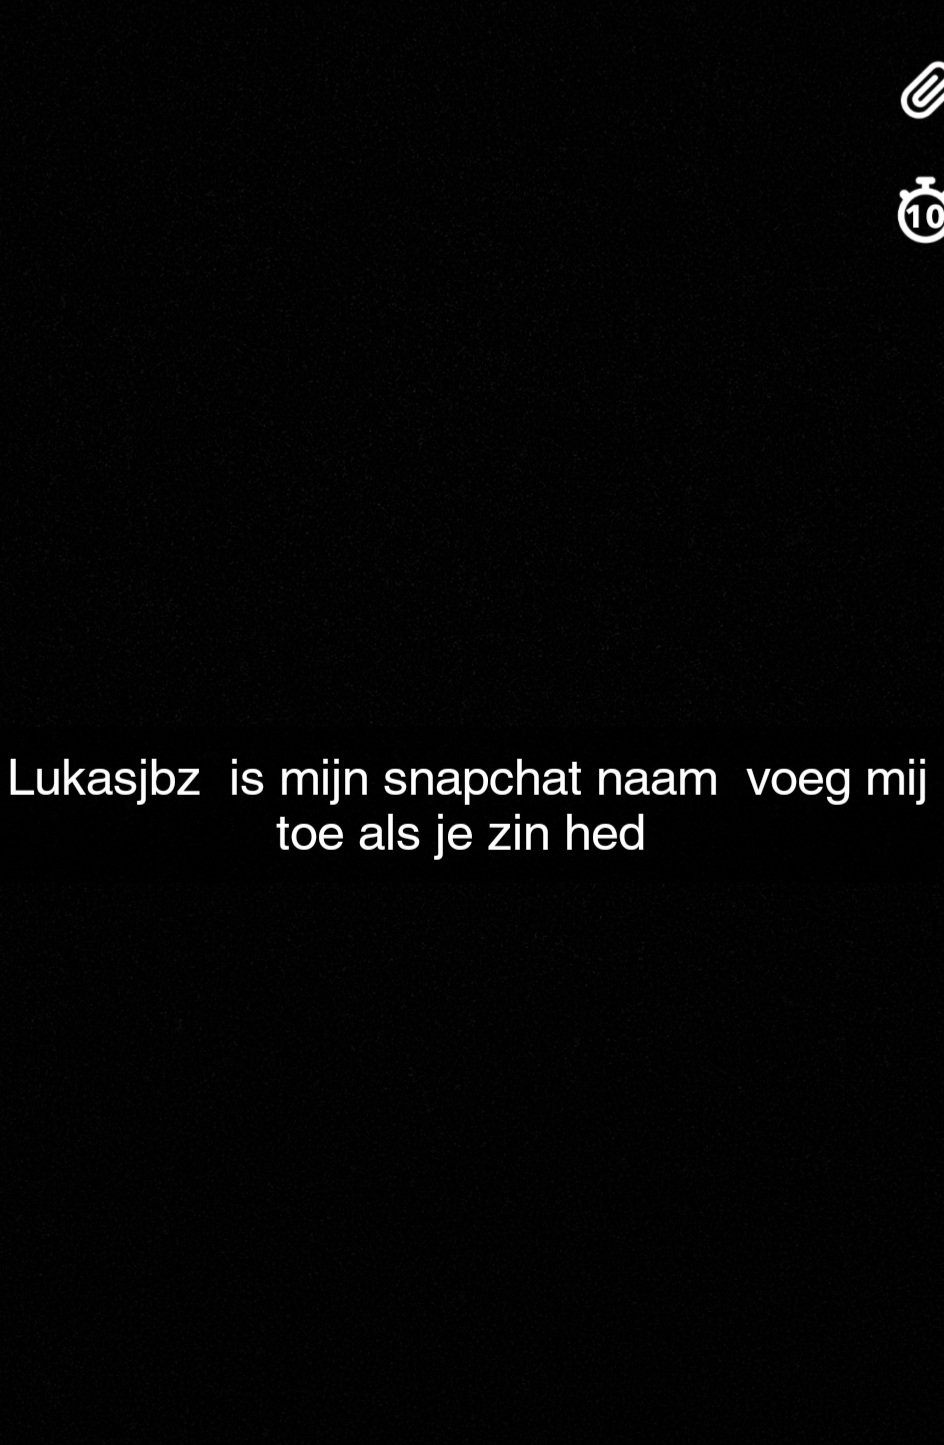 Lukas ggg uit Flevoland,Nederland